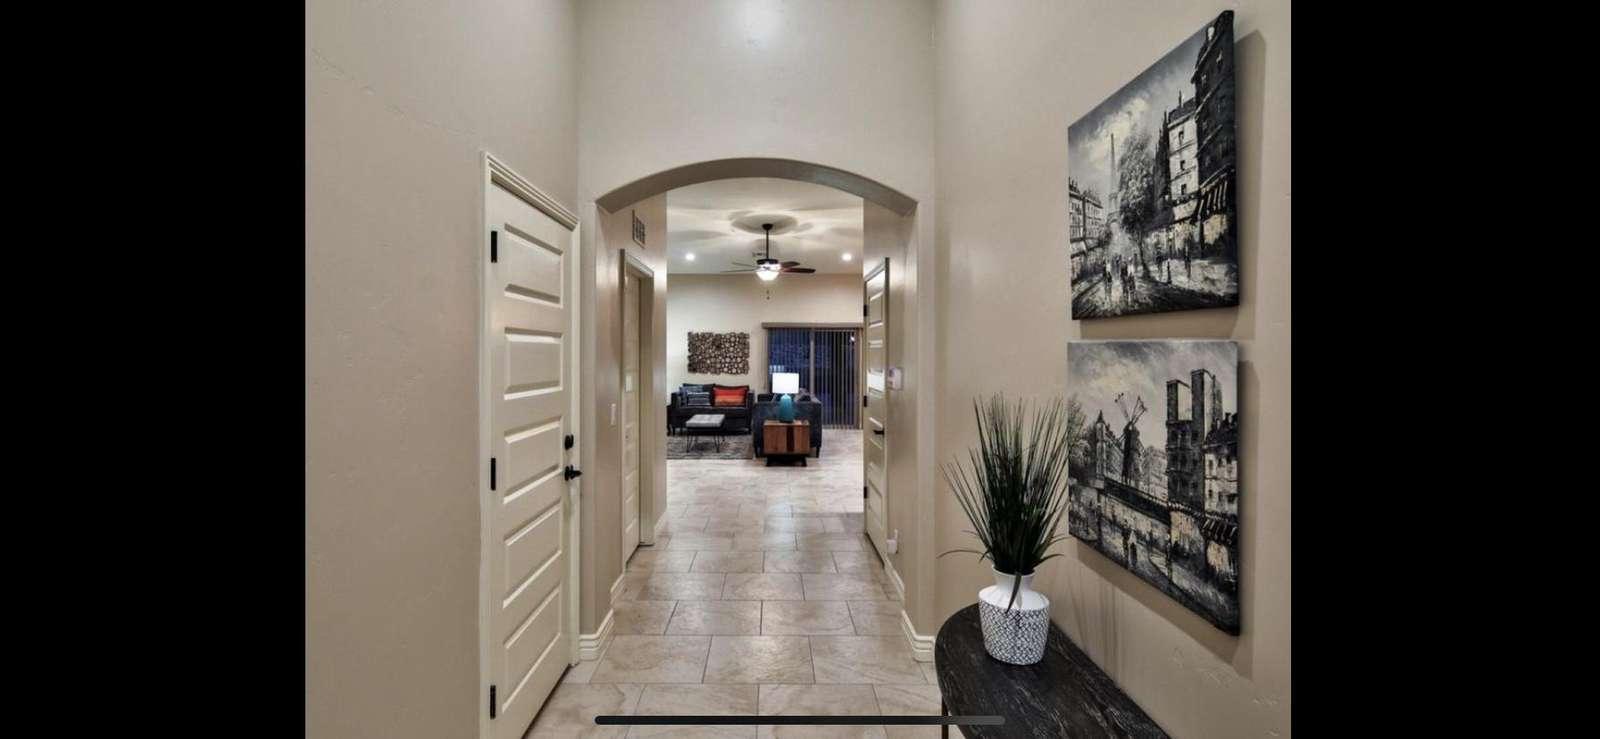 Cozy Casa by Jodi - property